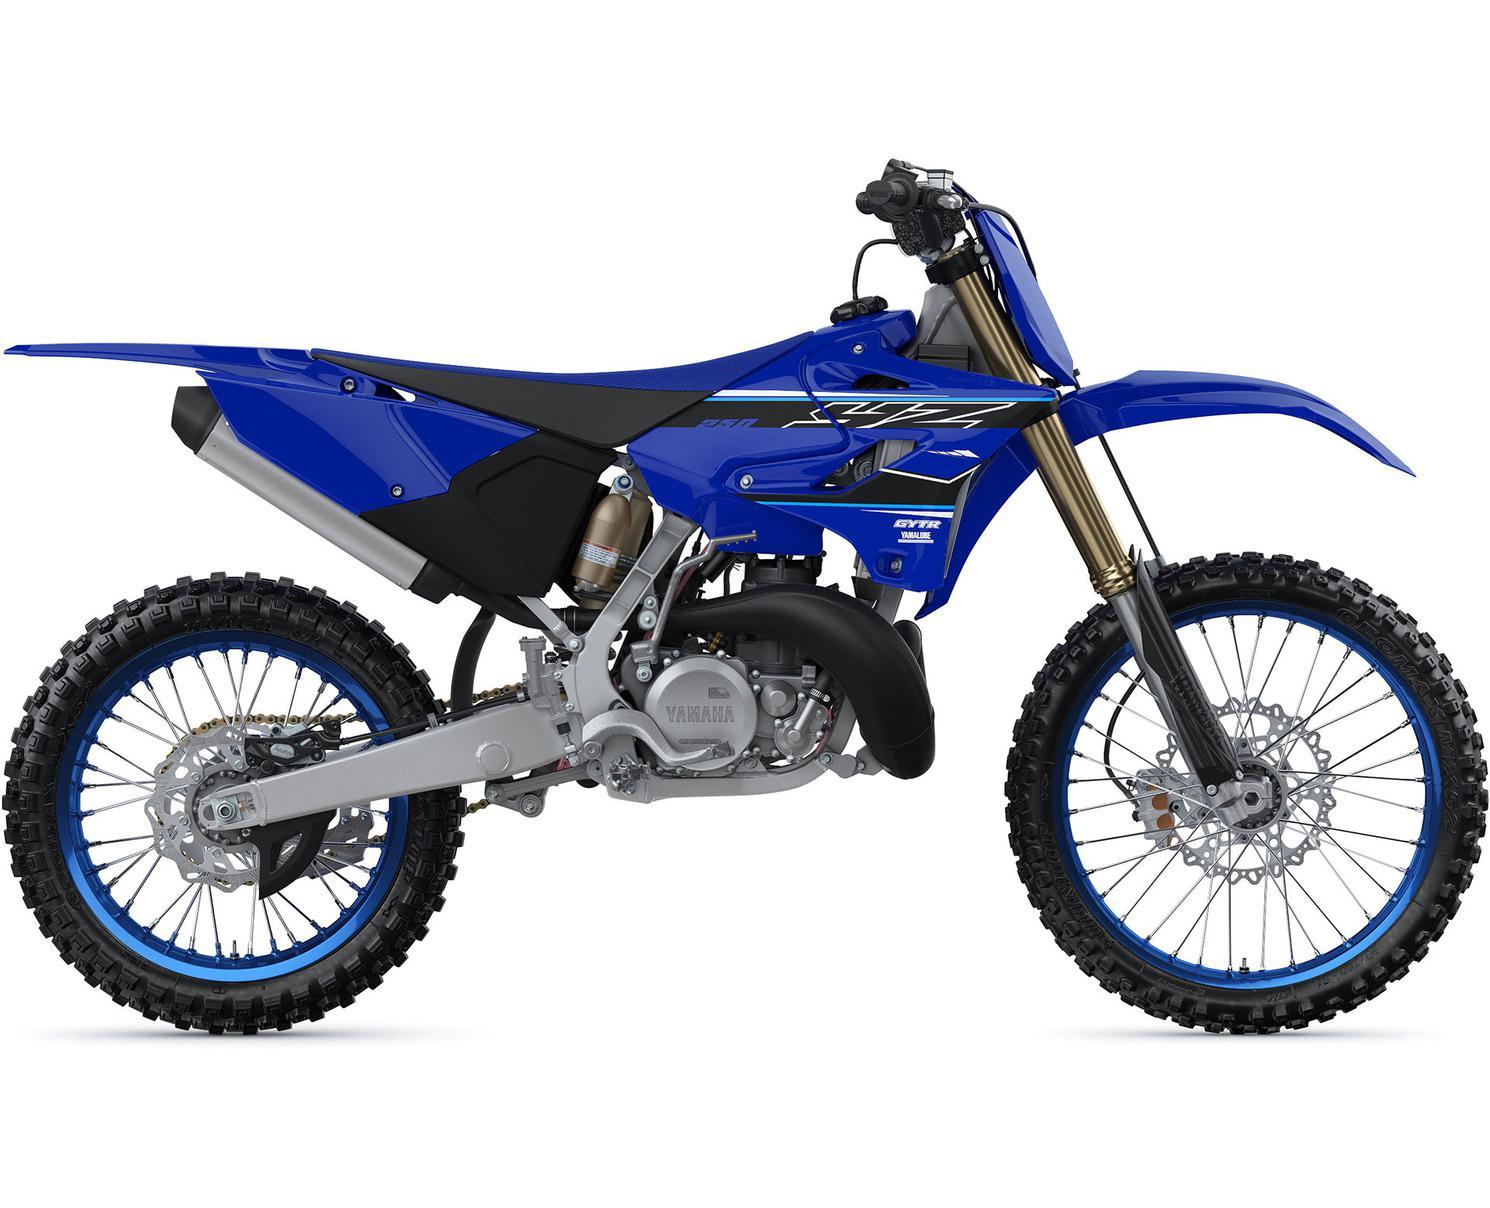 2021 Yamaha YZ250 Yamaha Racing Blue